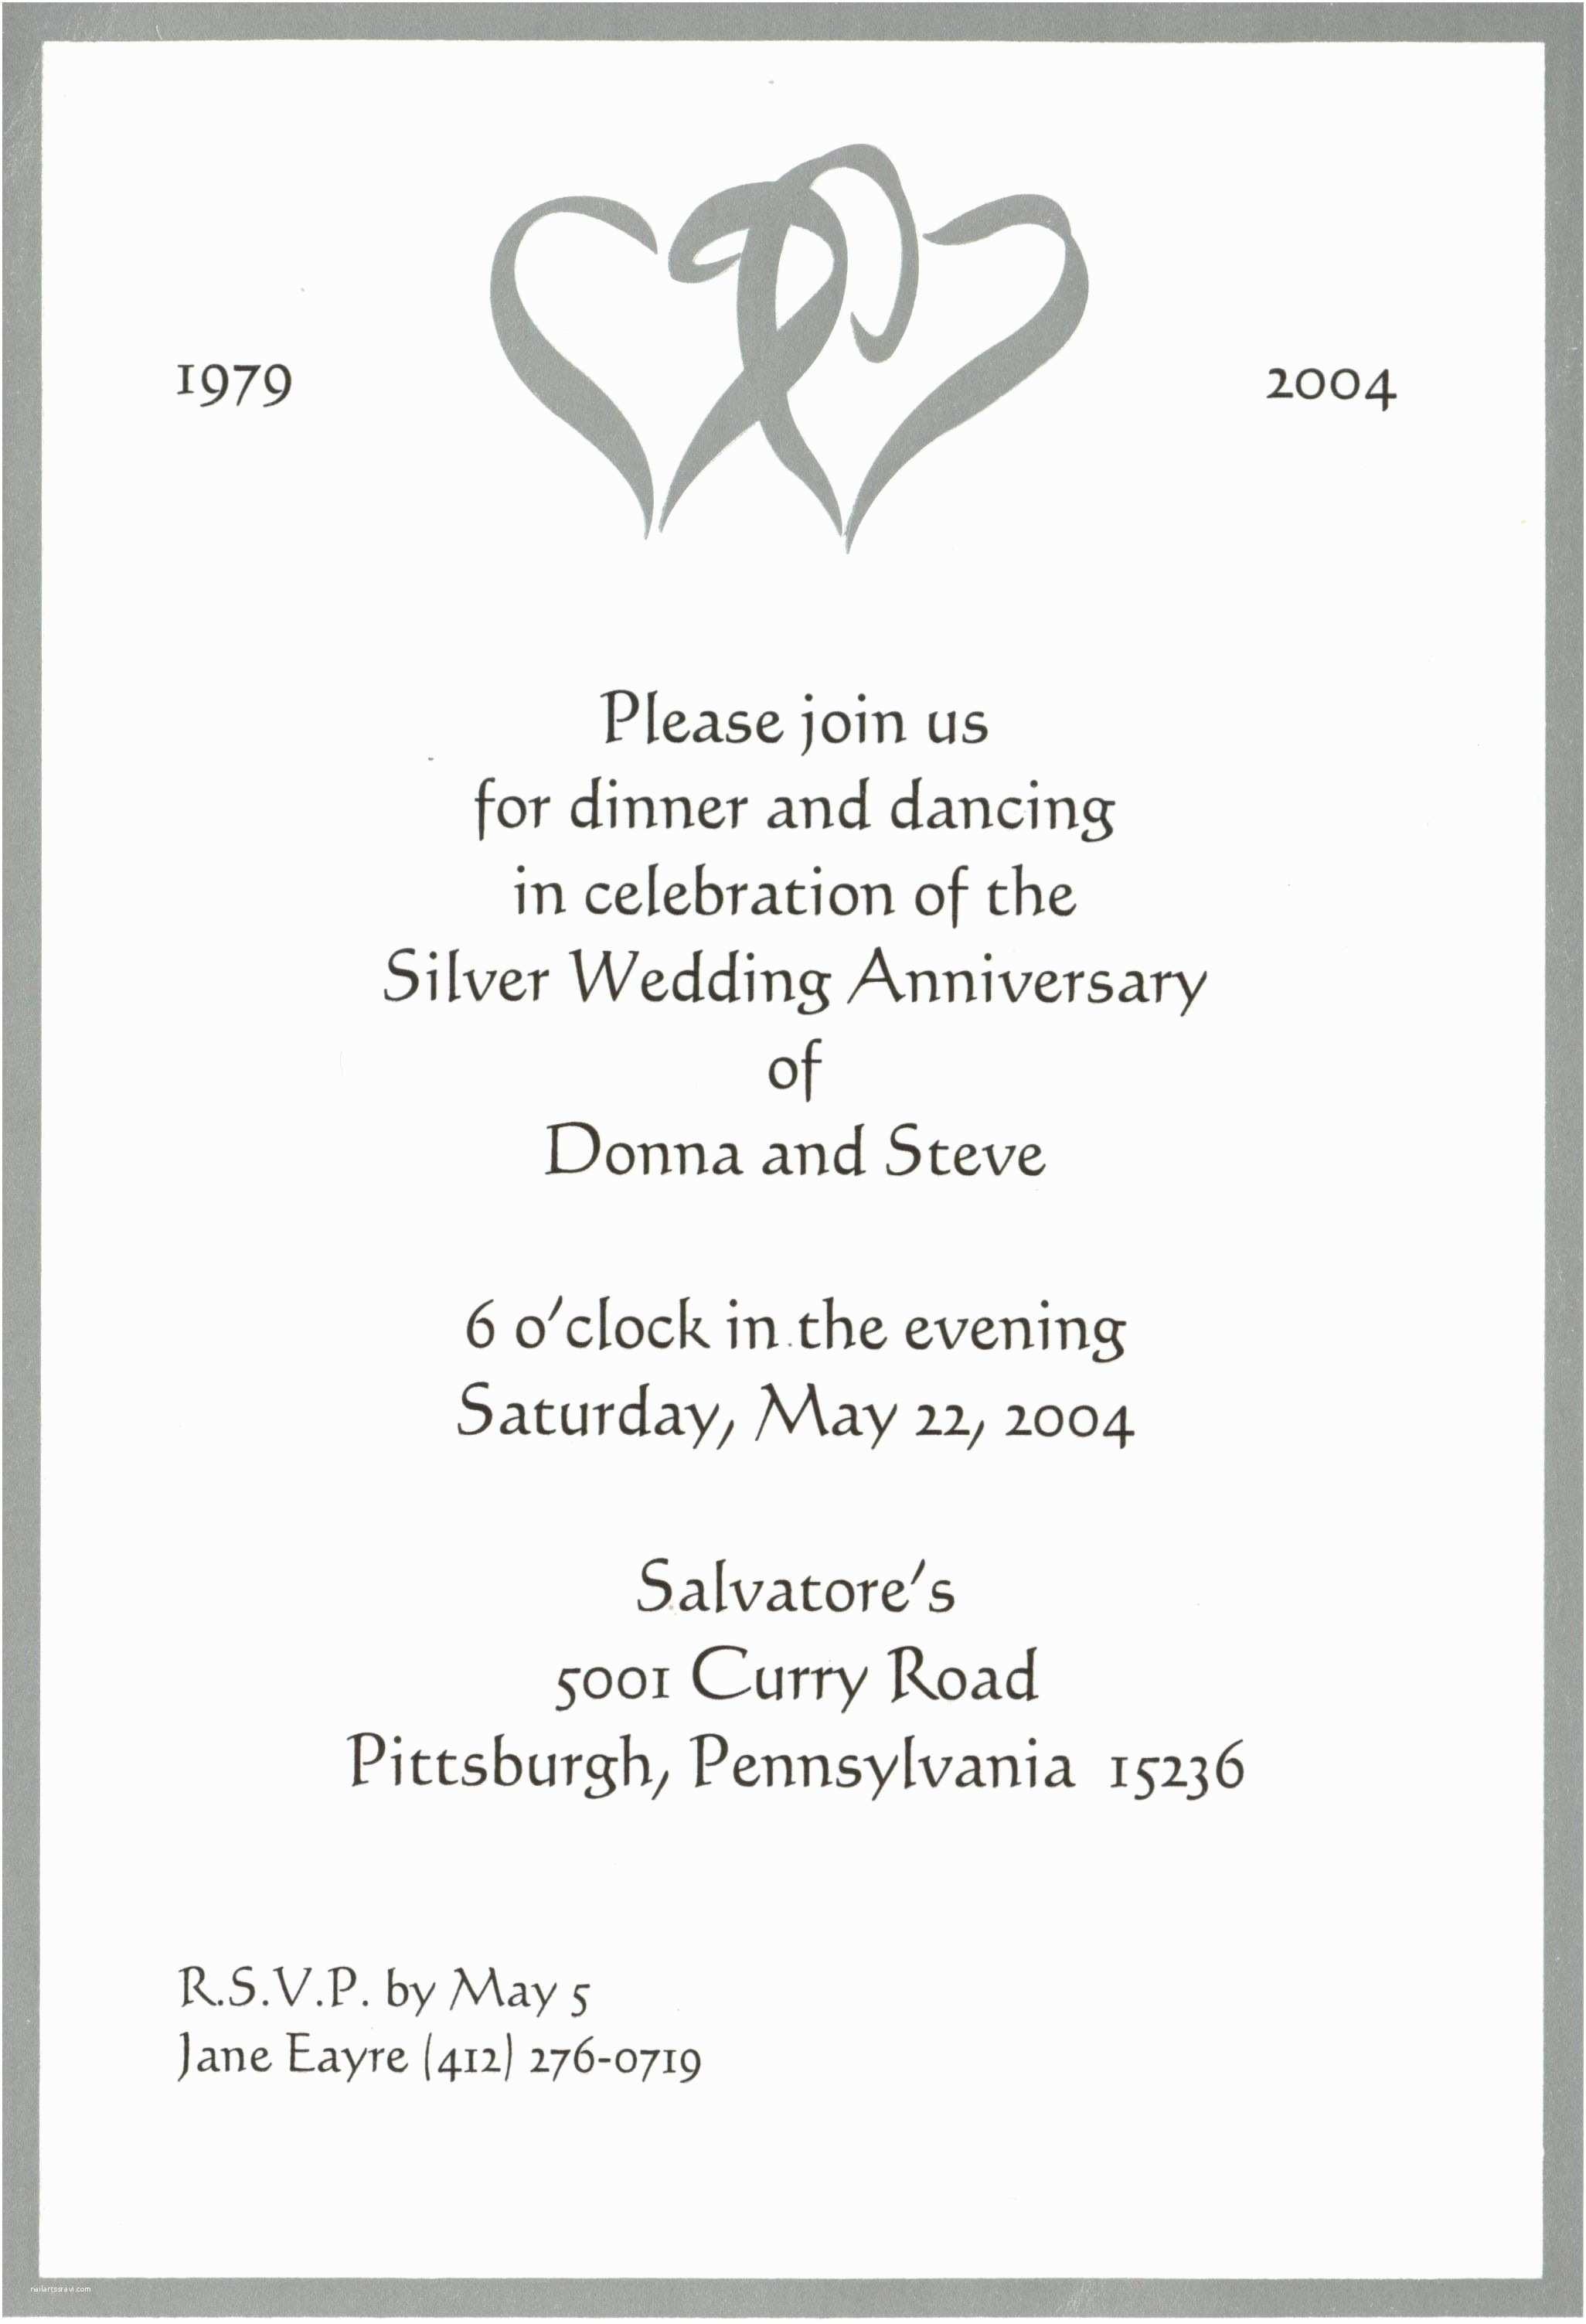 Personal Wedding Invitation Personal Wedding Invitation